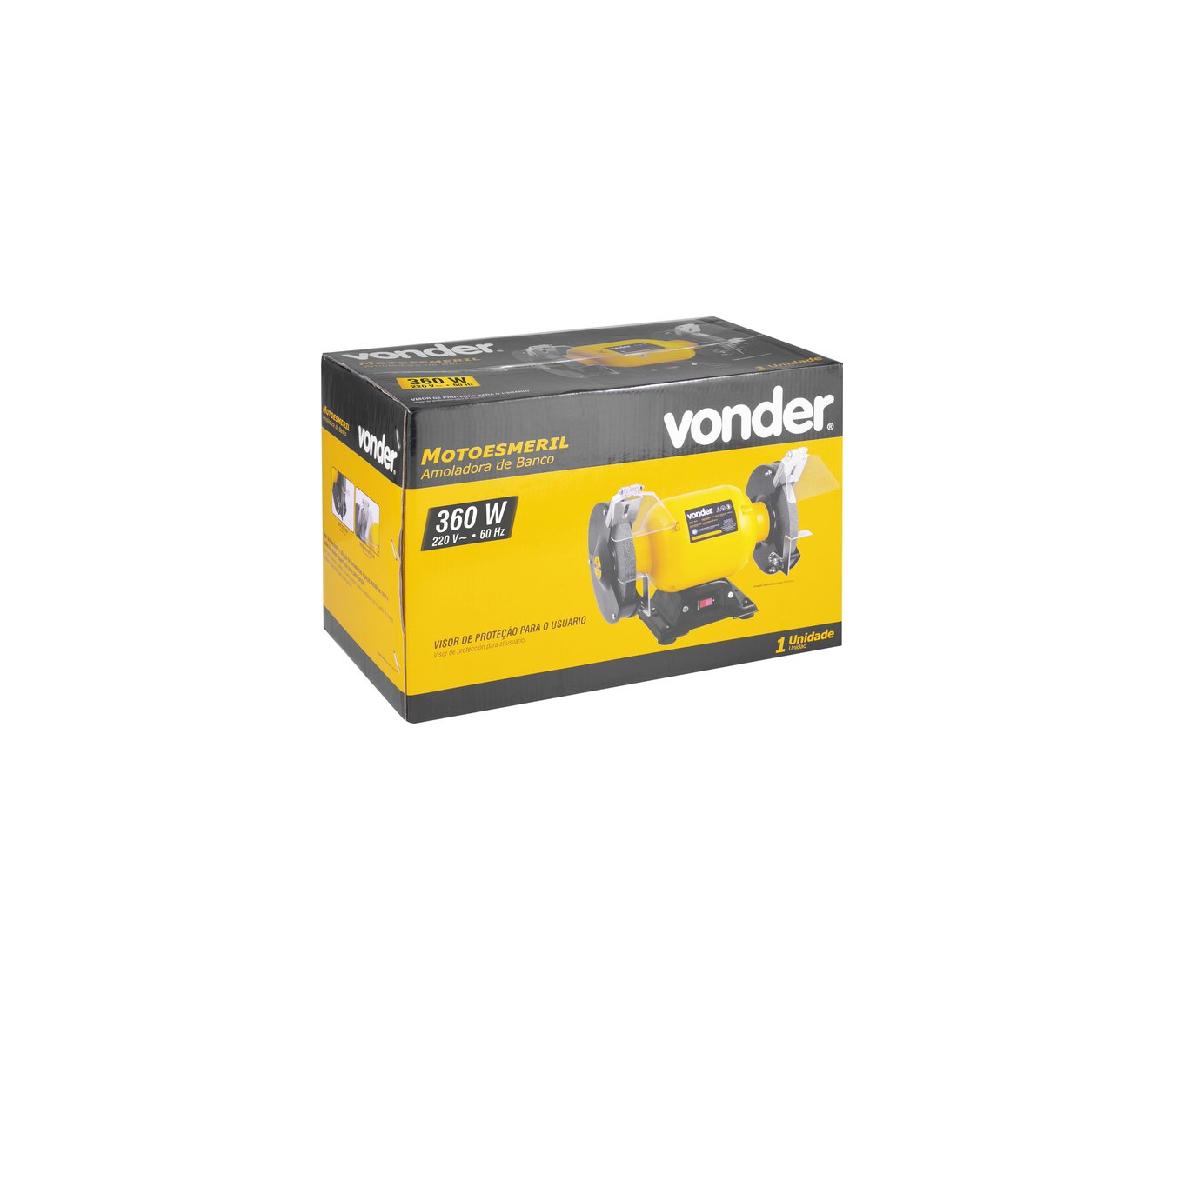 "Motoesmeril de Bancada 6"" 360W 220V VONDER"